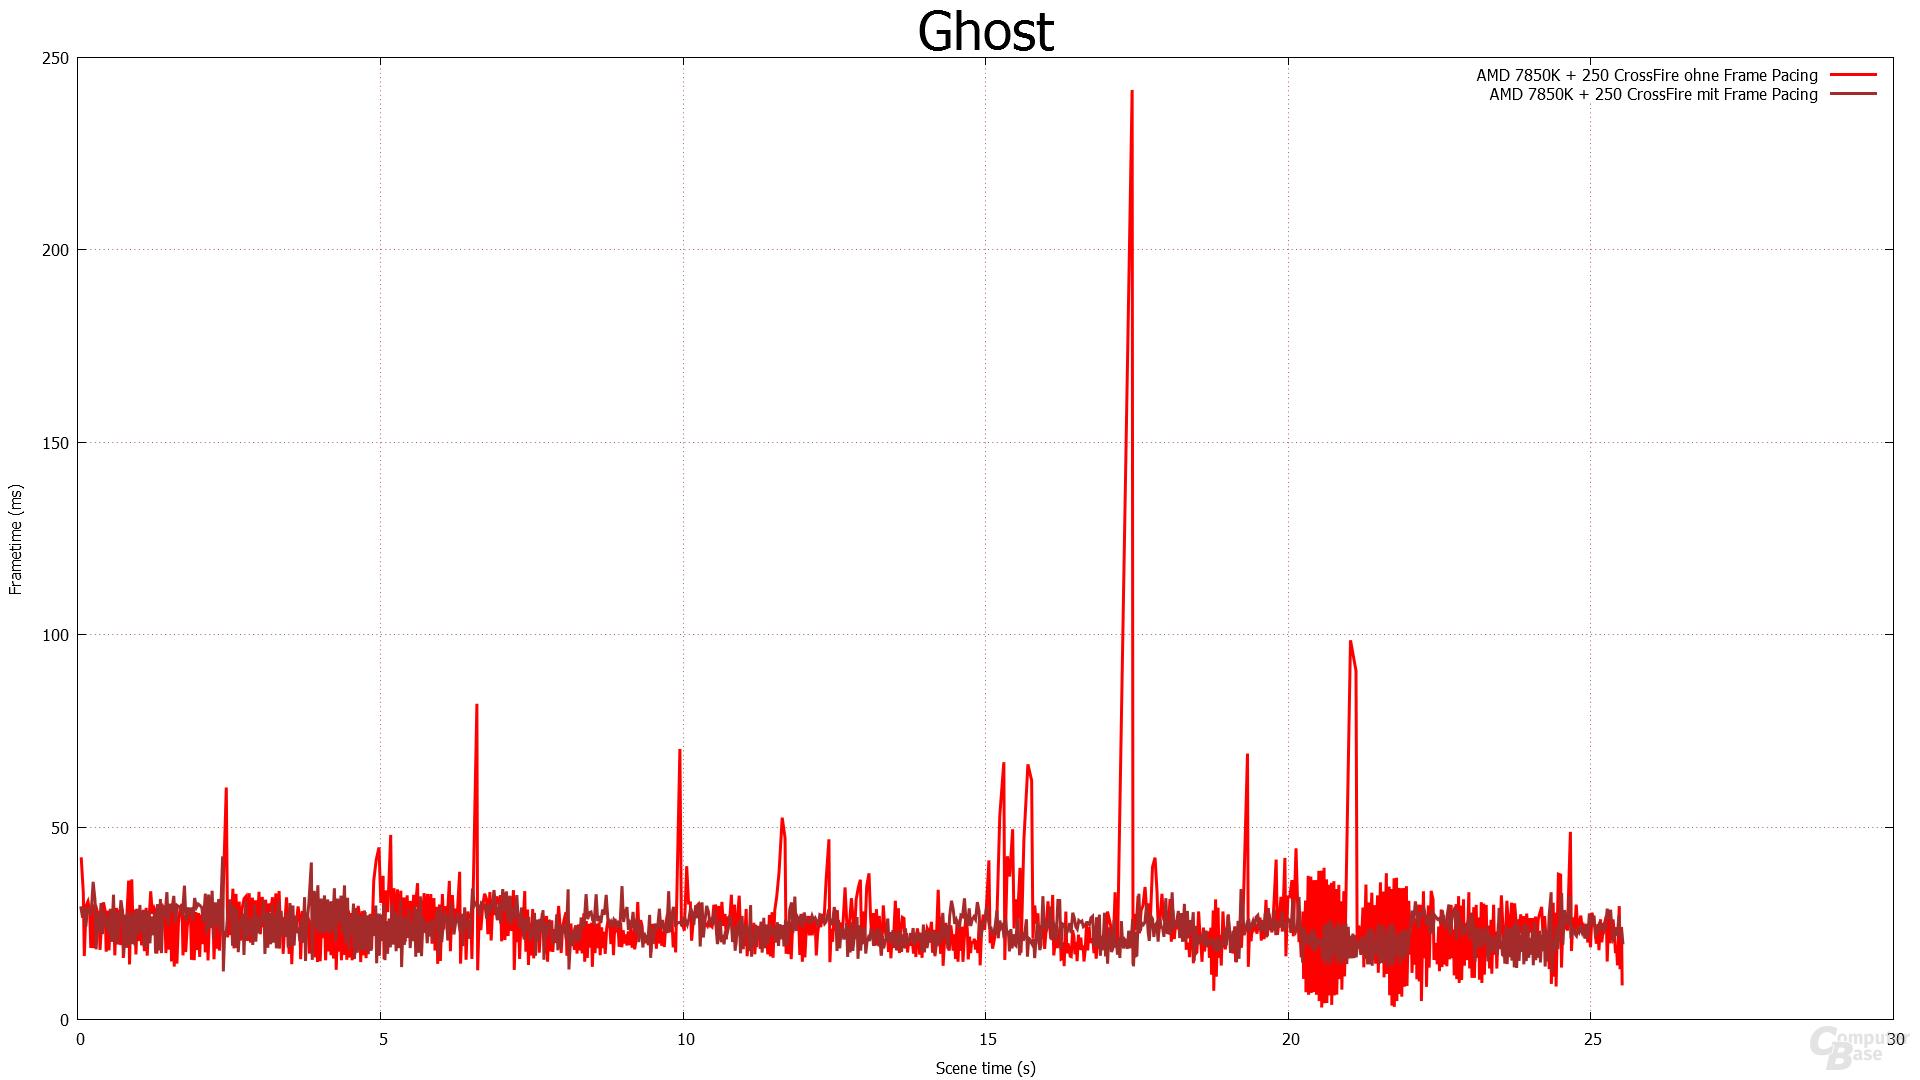 Frame Pacing - COD Ghost